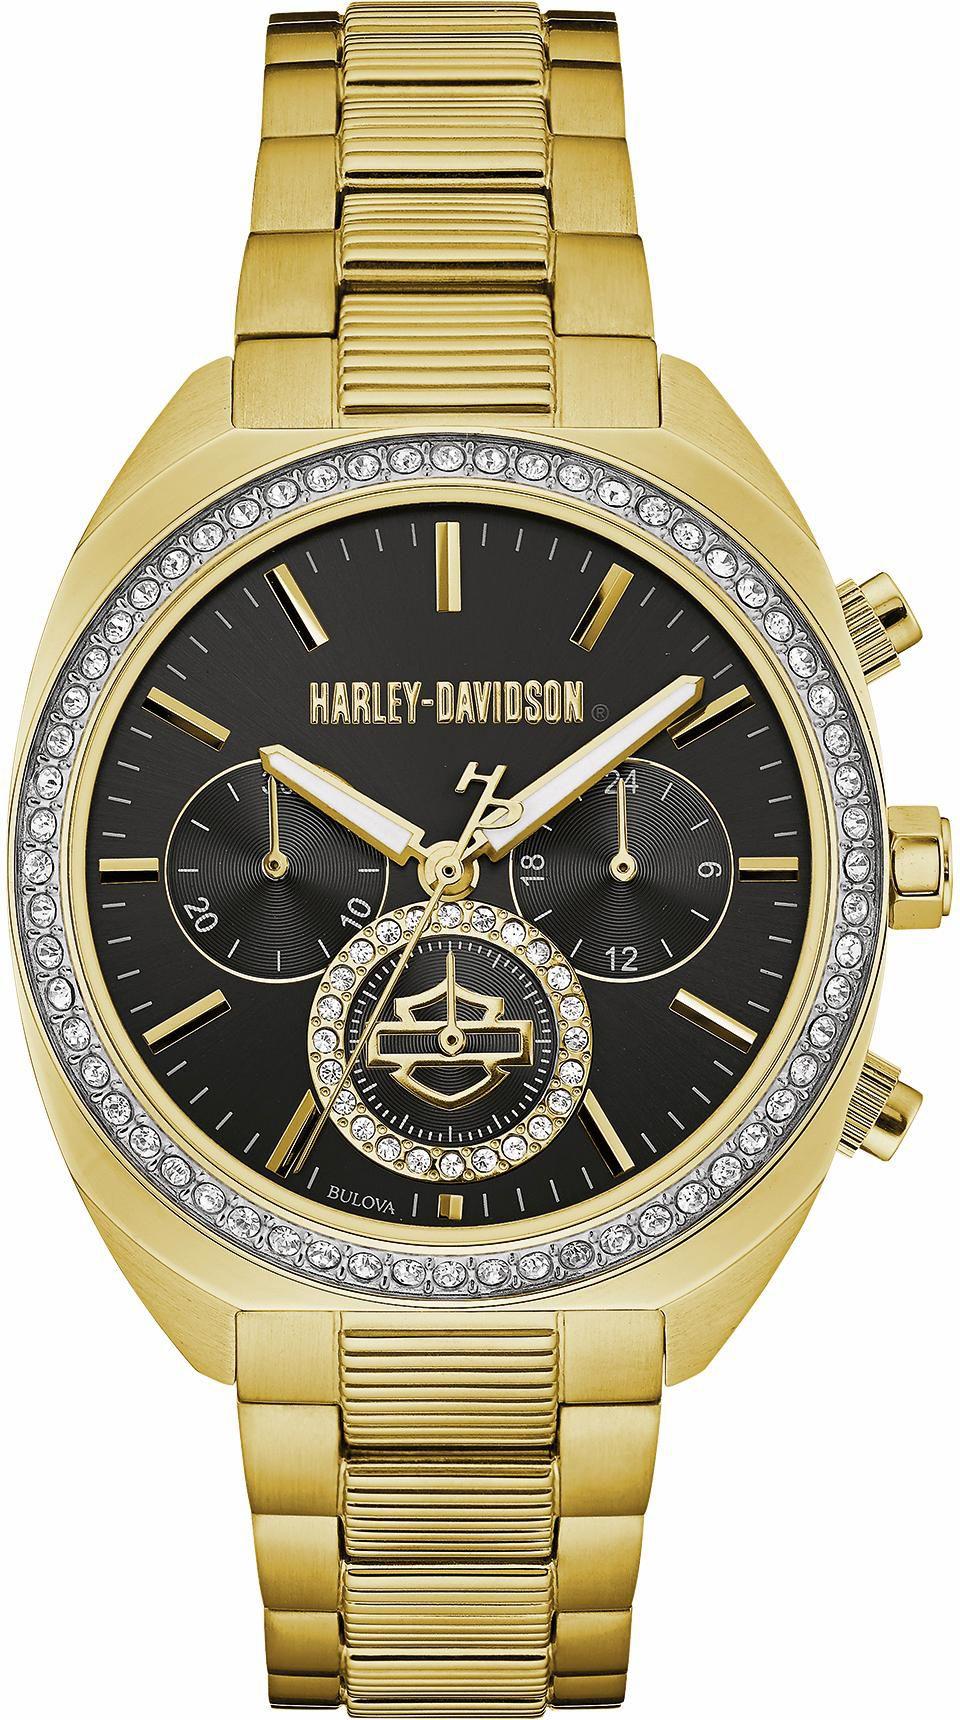 HARLEY DAVIDSON Harley Davidson Chronograph »Lady Gear, 77M103«